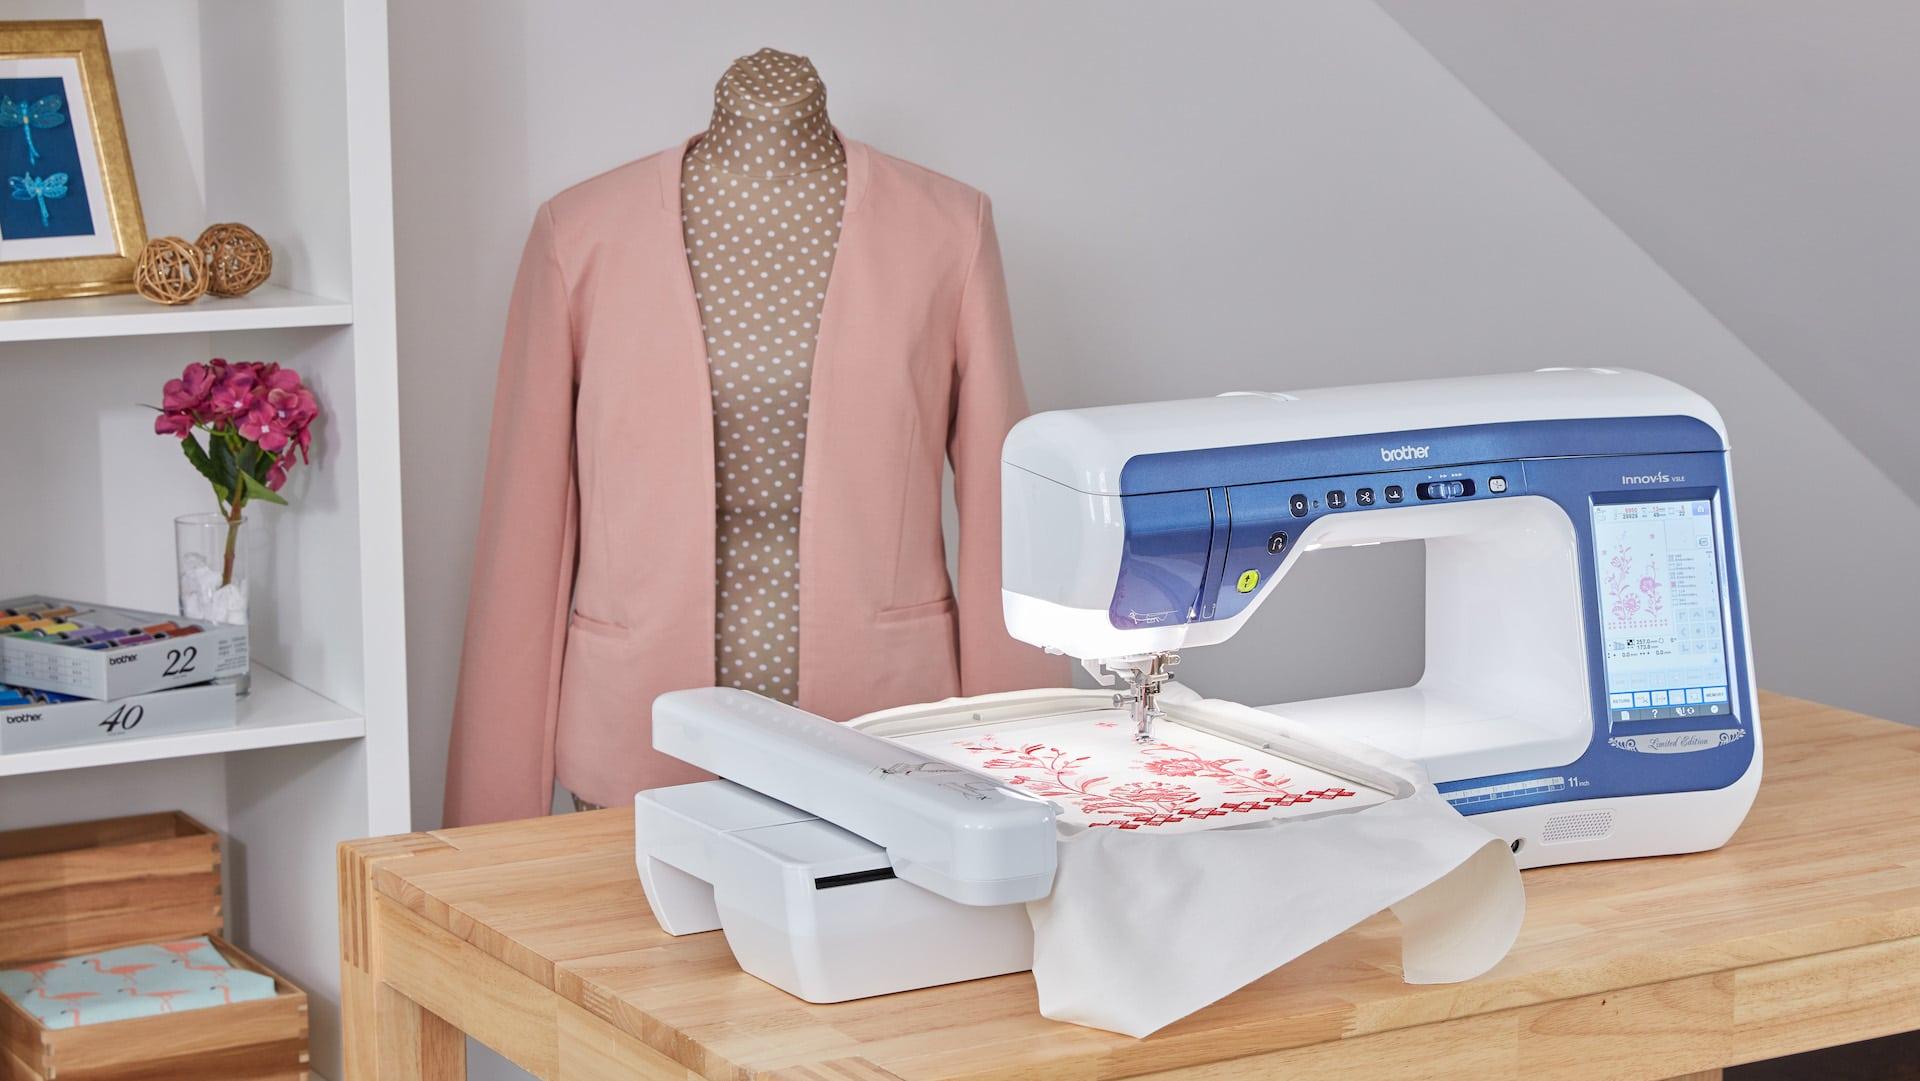 Top 10 Best Sewing Machines|( September 2021) Techyuga